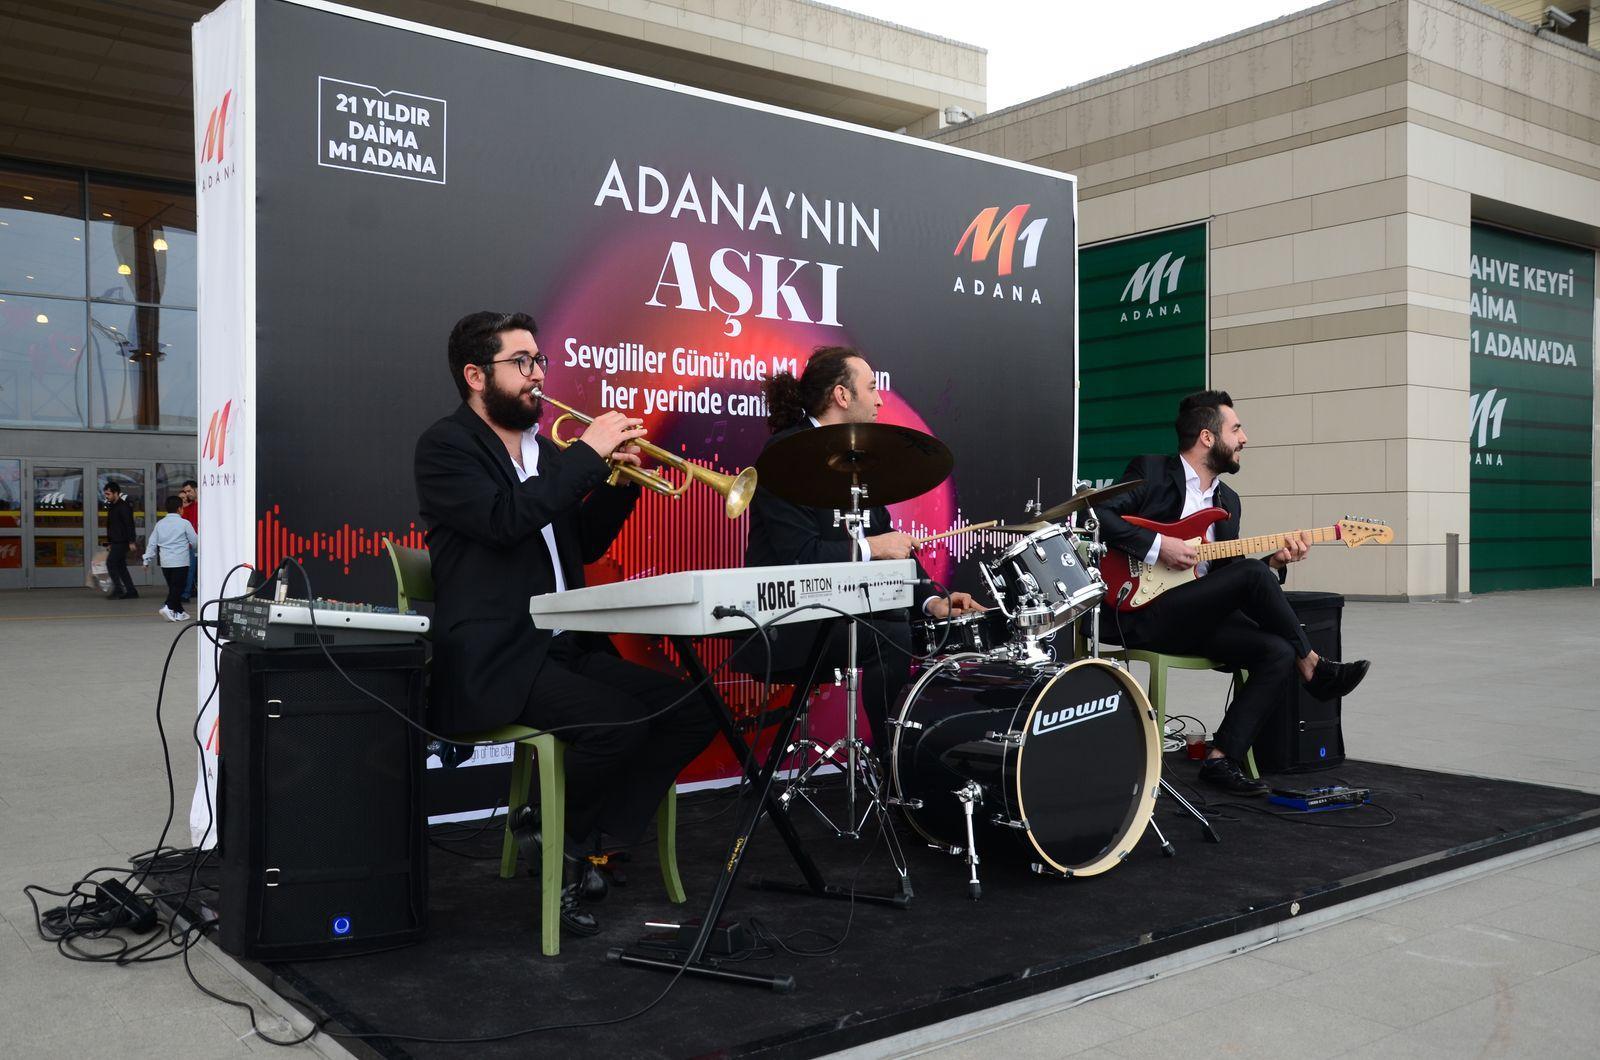 Adana'nın aşkı M1 Adana AVM'de